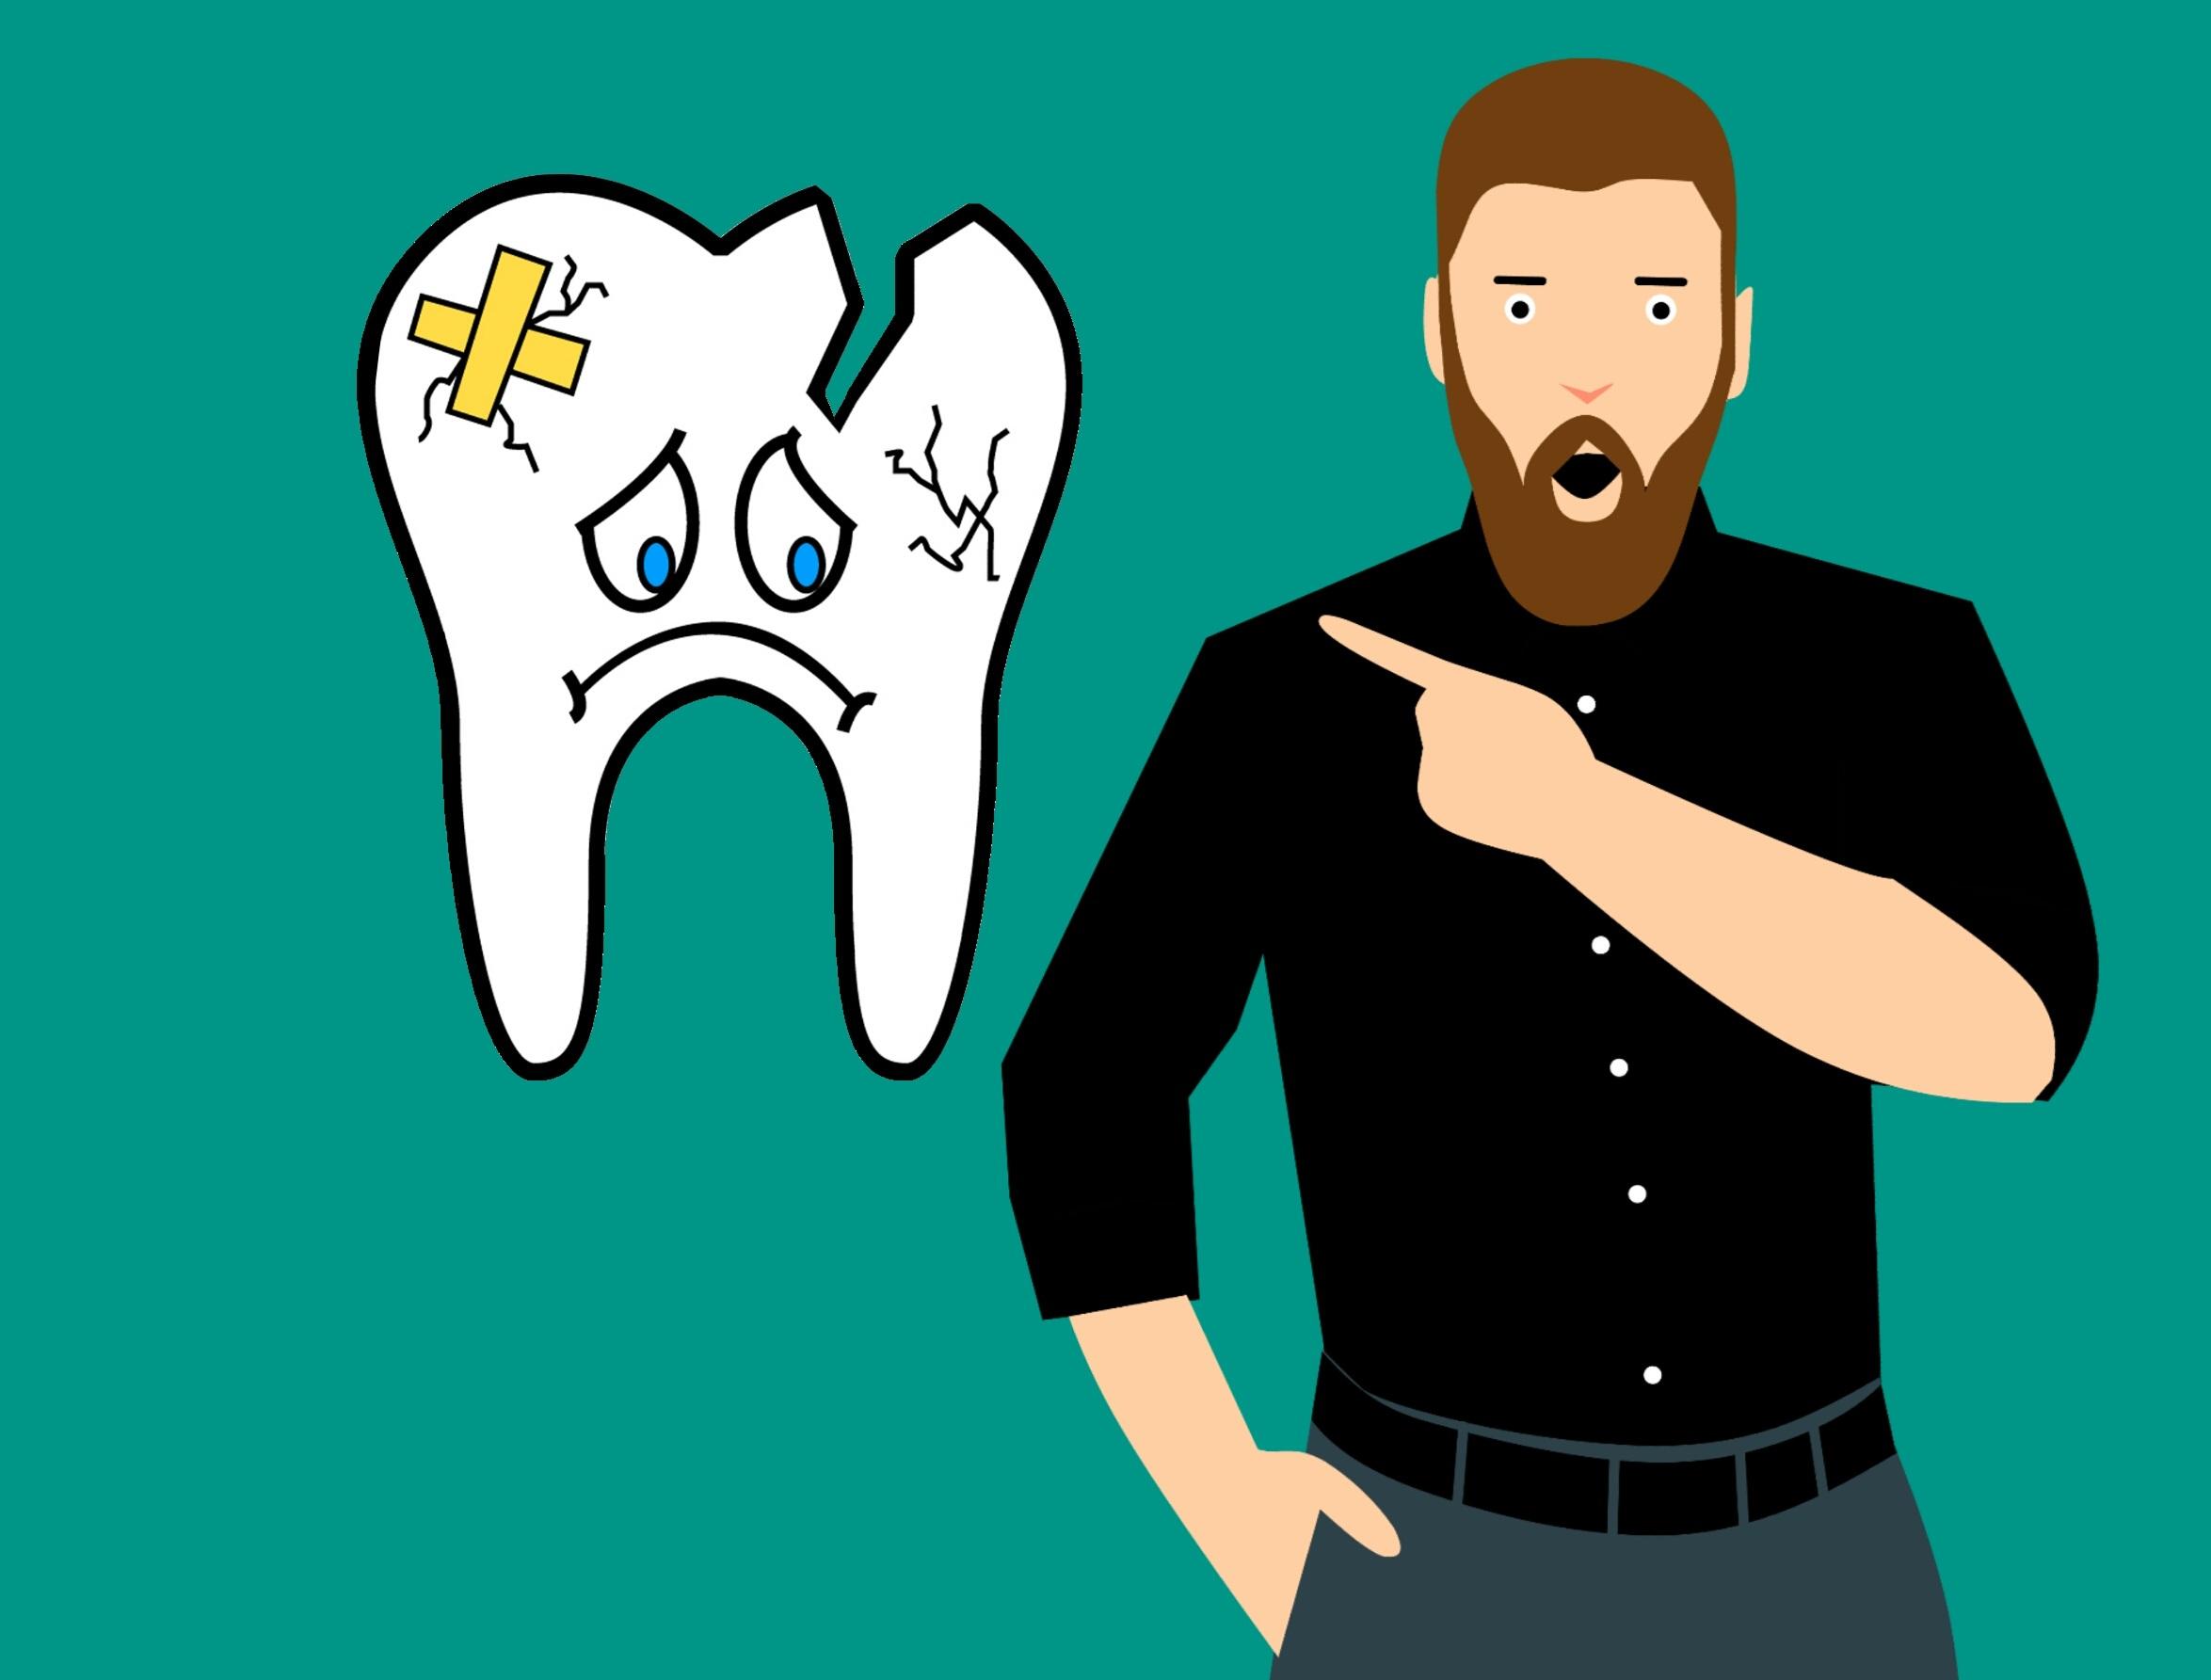 free images   broken tooth  teeth  dentist  medicine  dentistry  oral  medical  hygiene